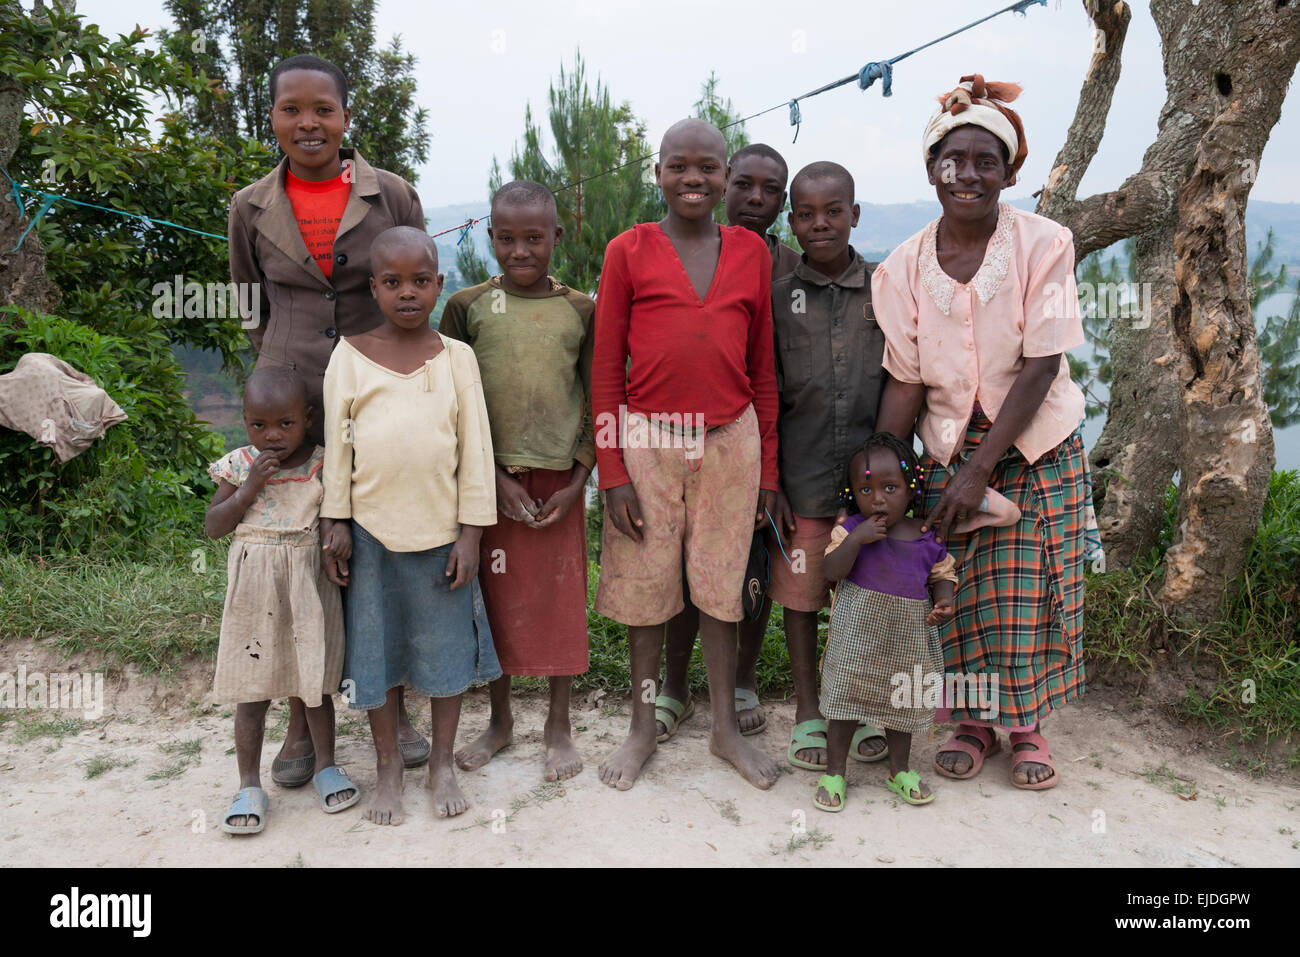 Famille d'agriculteurs. pause lac Bunyonyi. L'Ouganda. Photo Stock